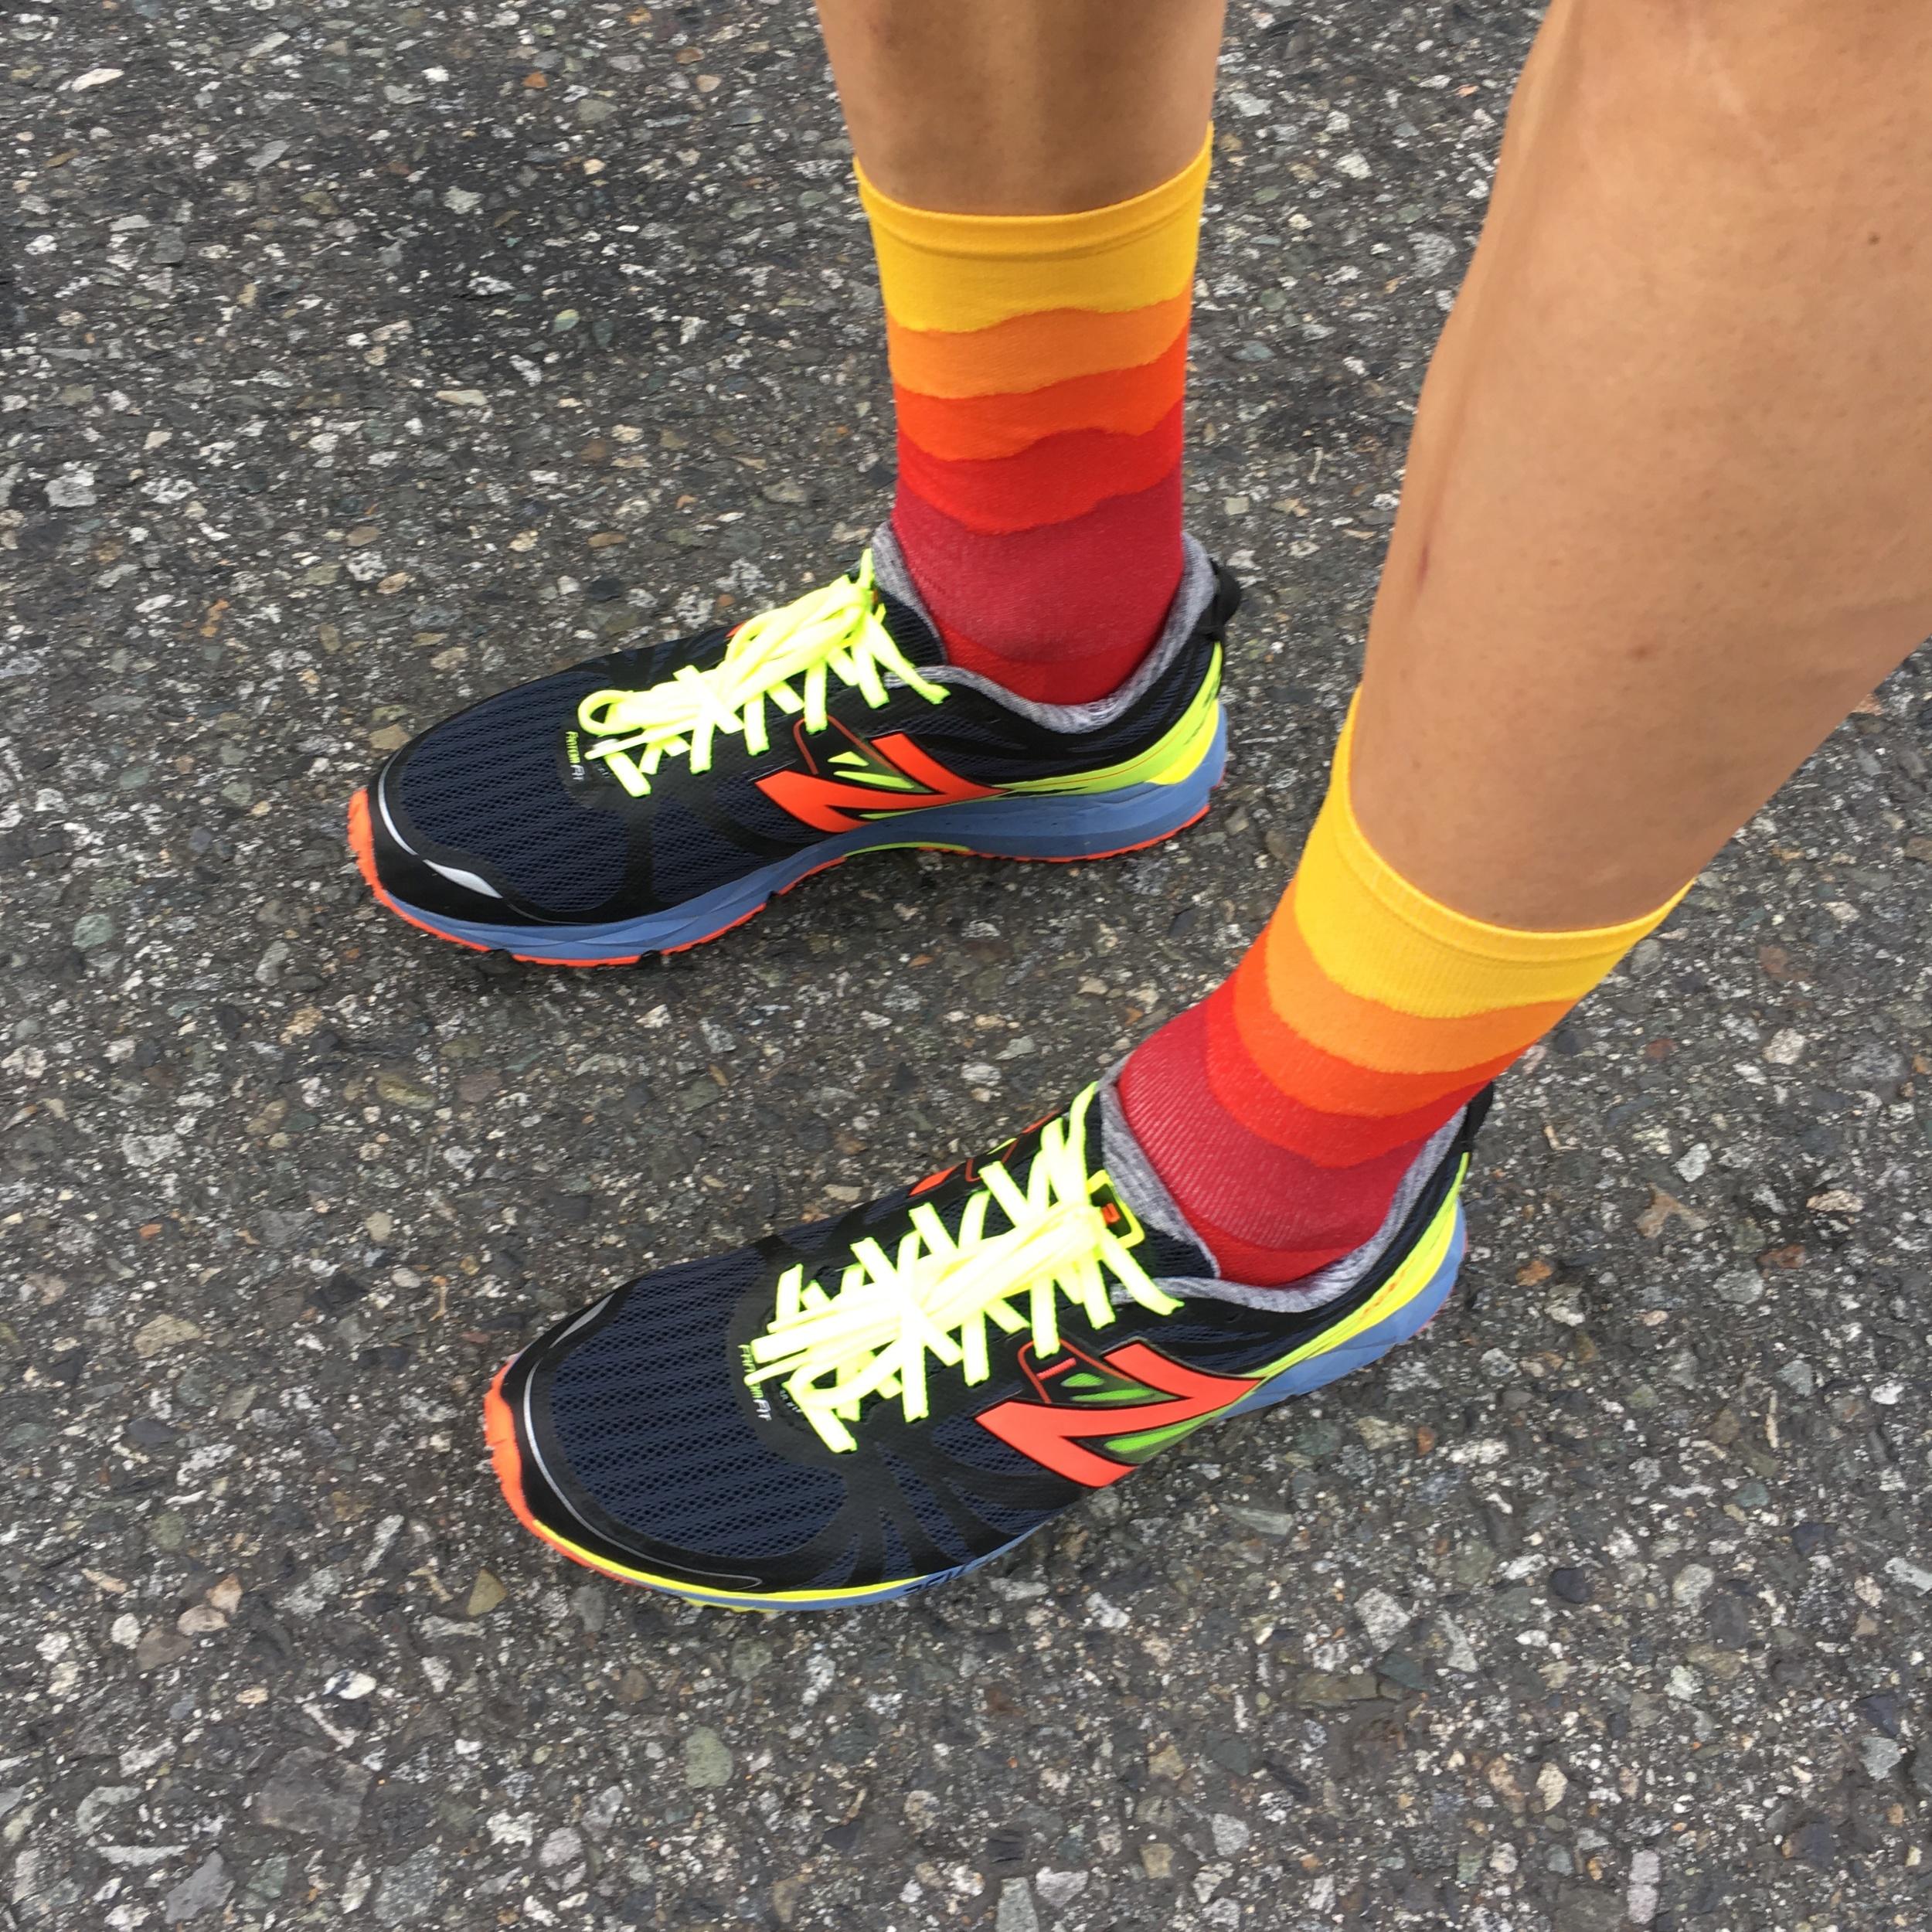 Winning the sock game...